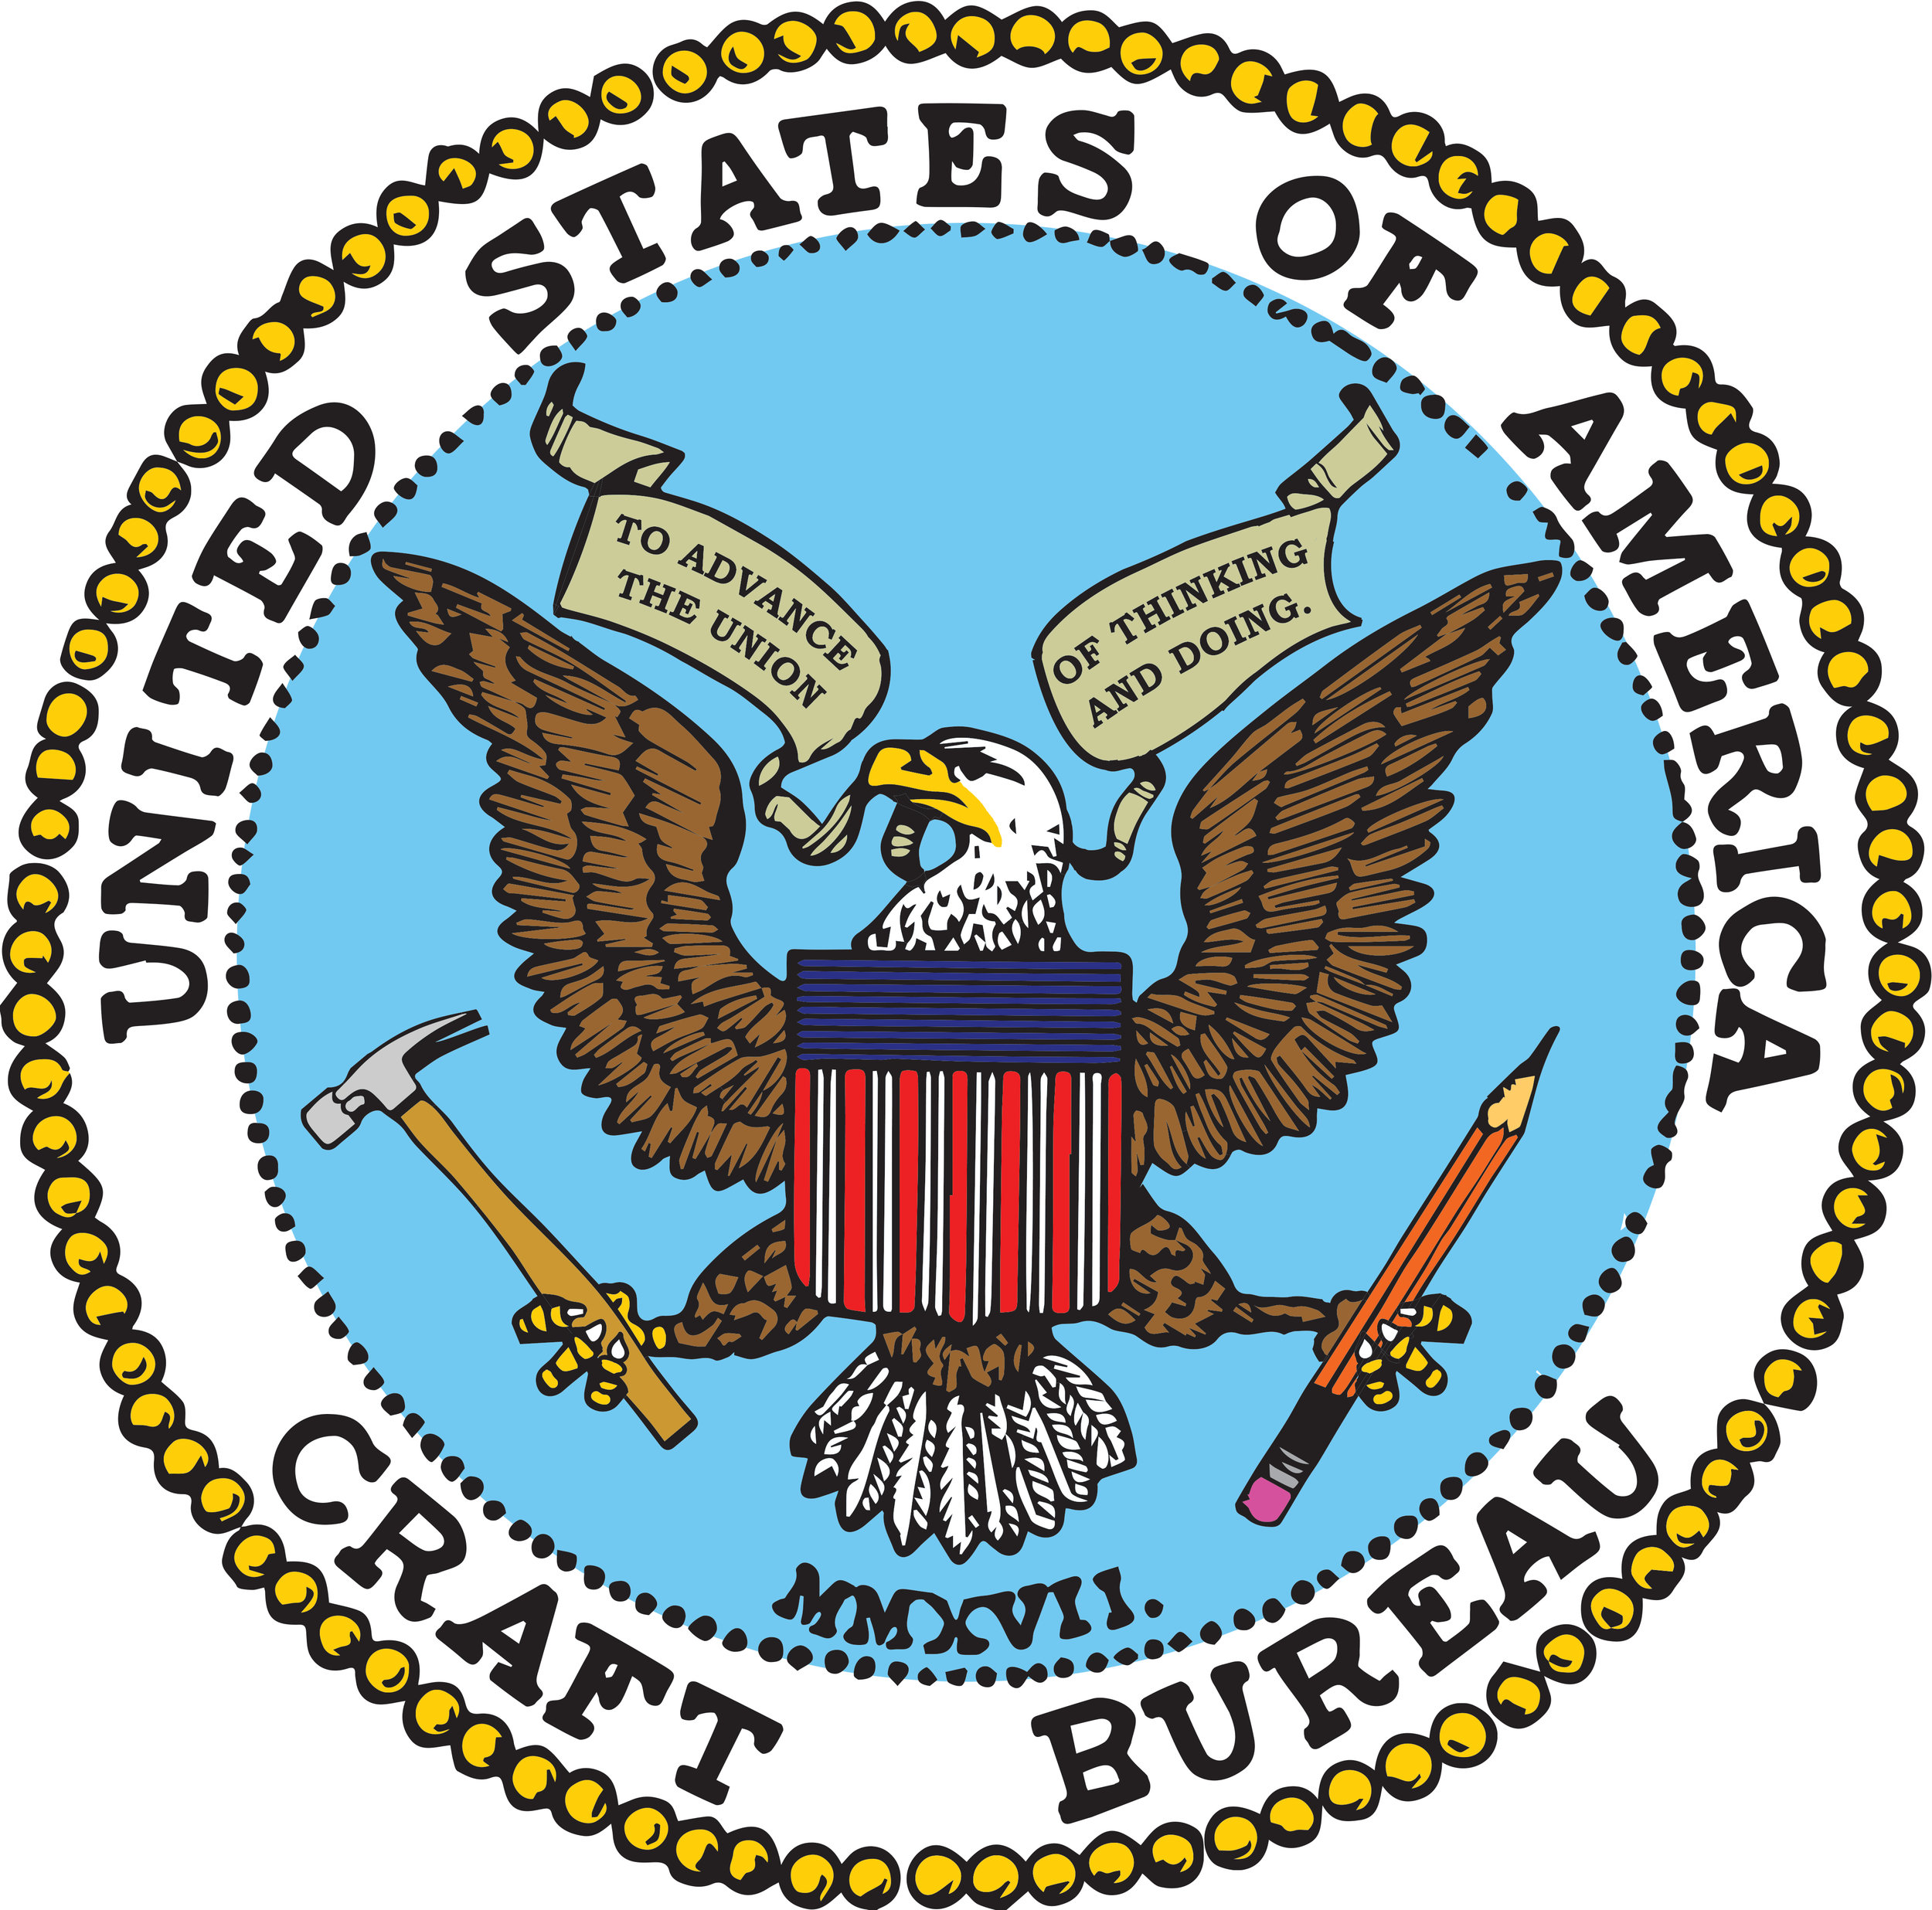 U.S. Craft Bureau offical seal